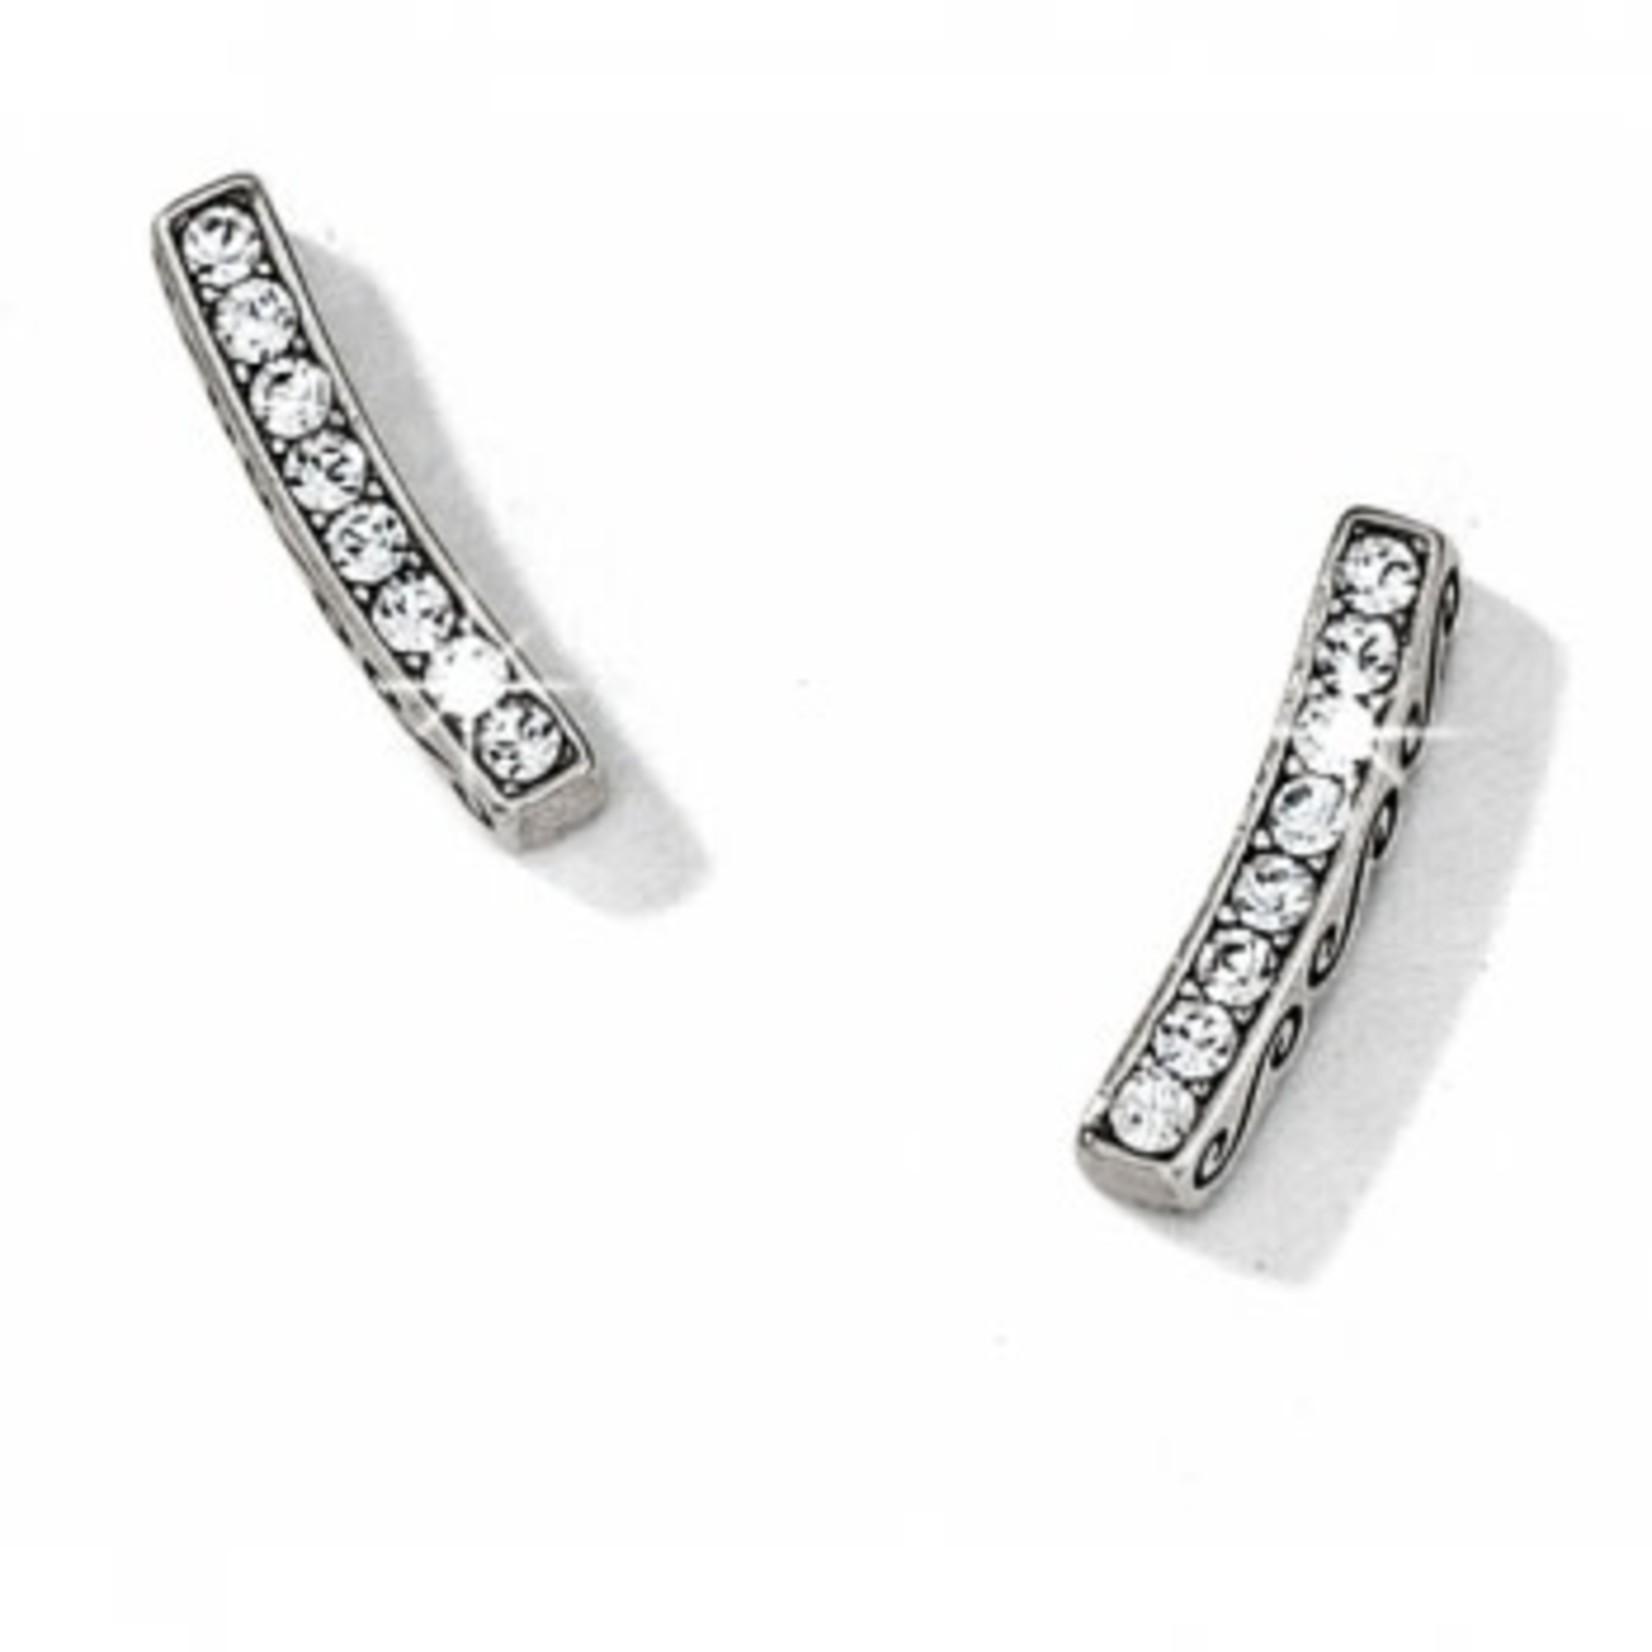 Brighton Chara Post Earrings silver